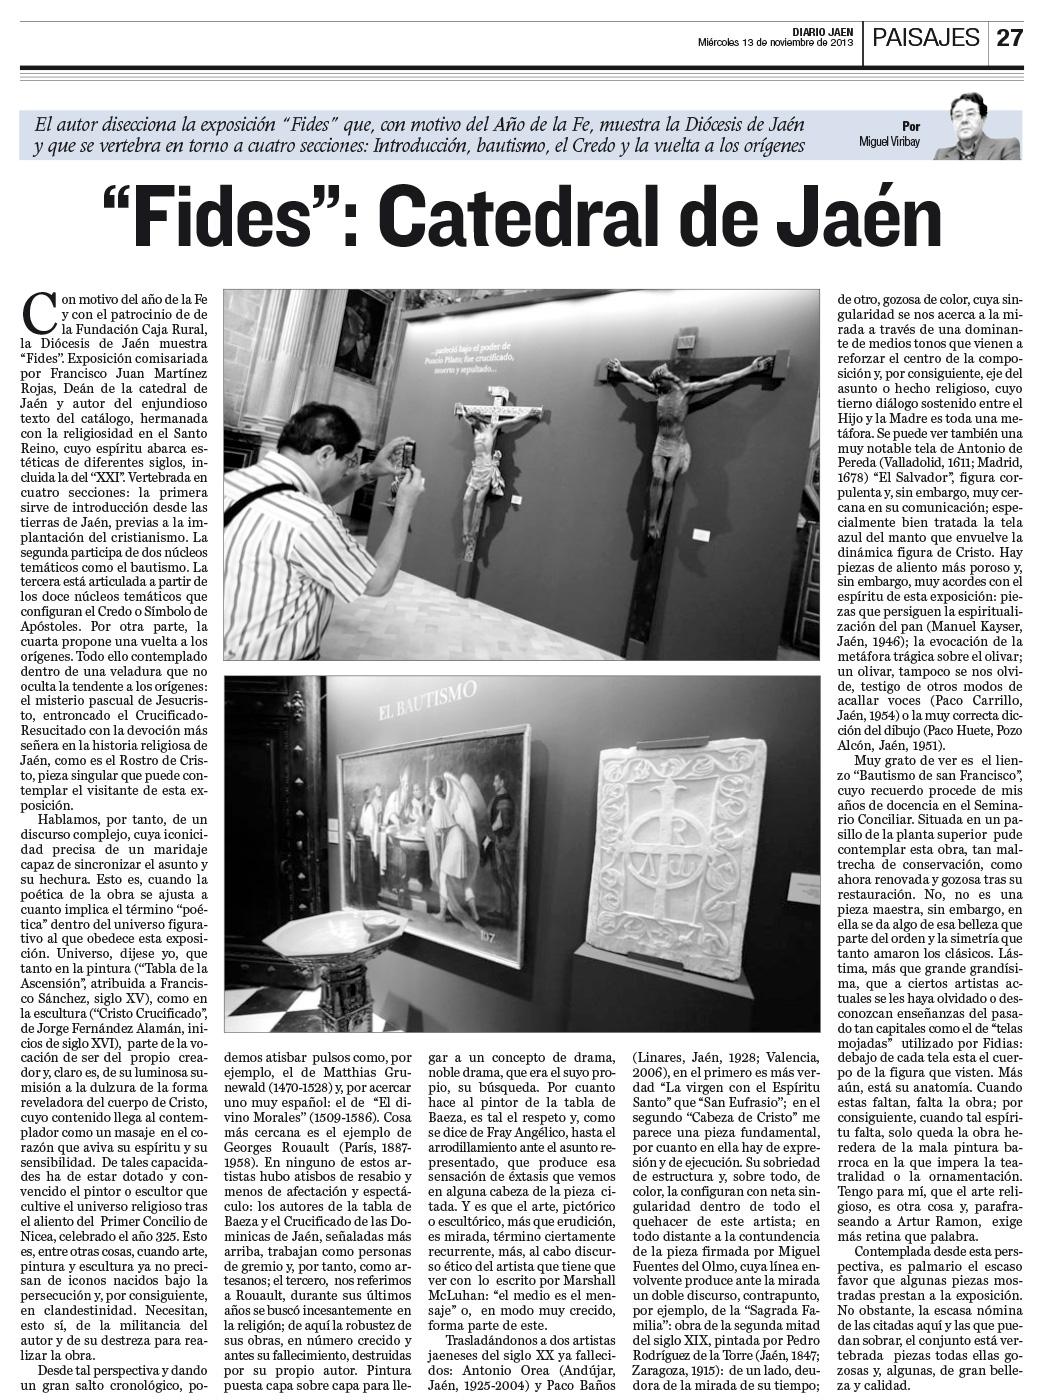 """Fides"": Catedral de Jaén (Diario de Jaén)"